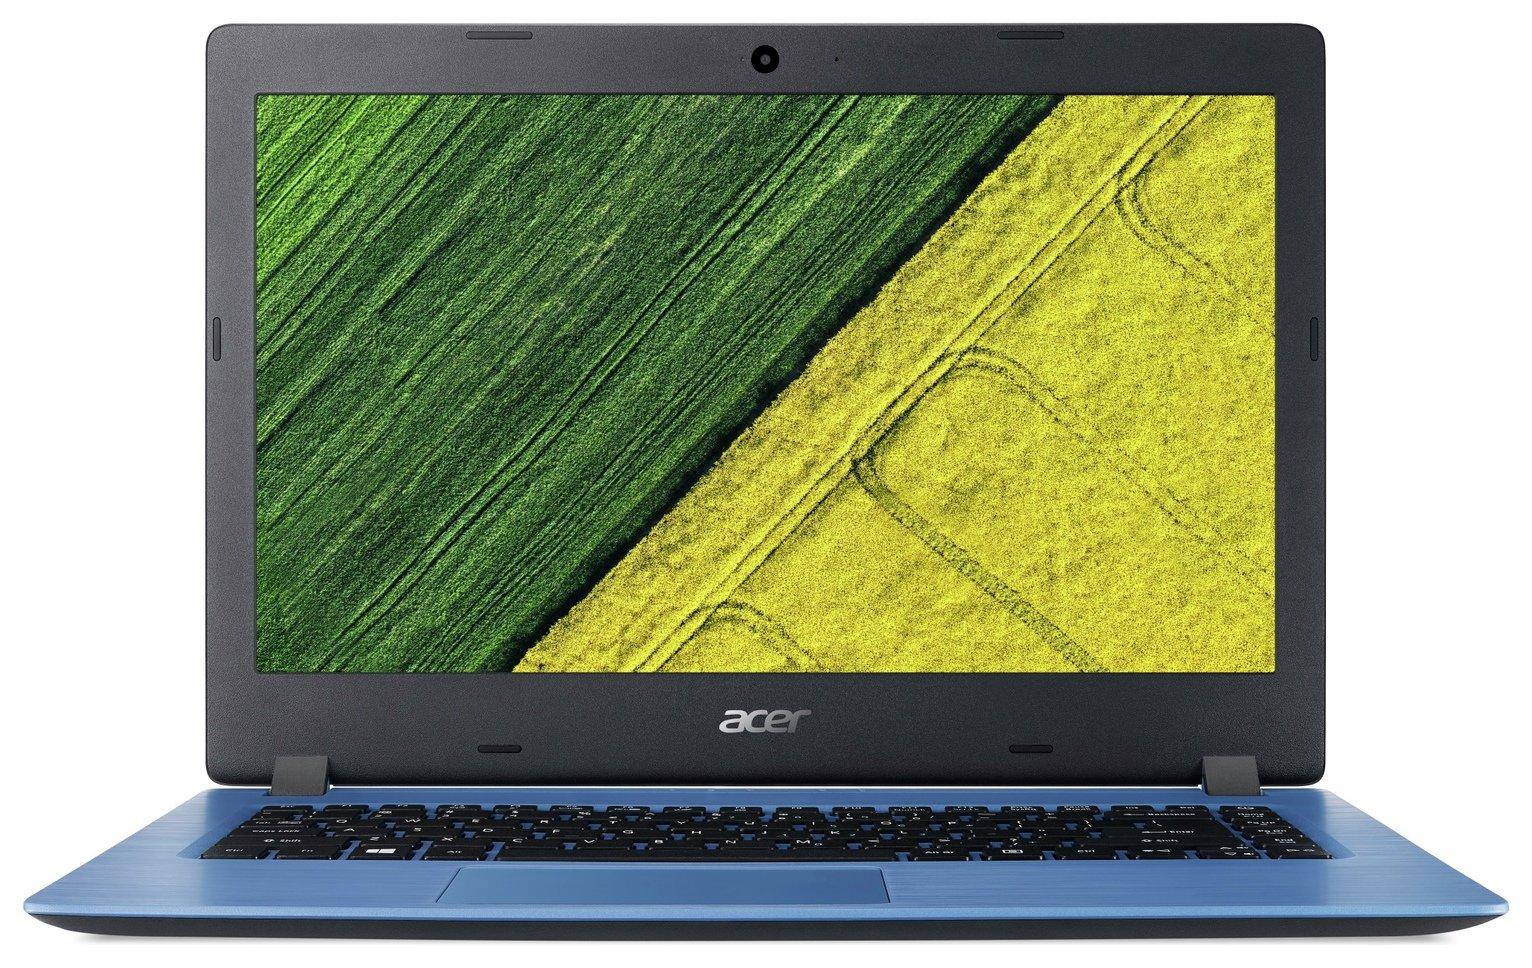 Acer Aspire 1 14 Inch Celeron 4GB 32GB Cloudbook - Blue